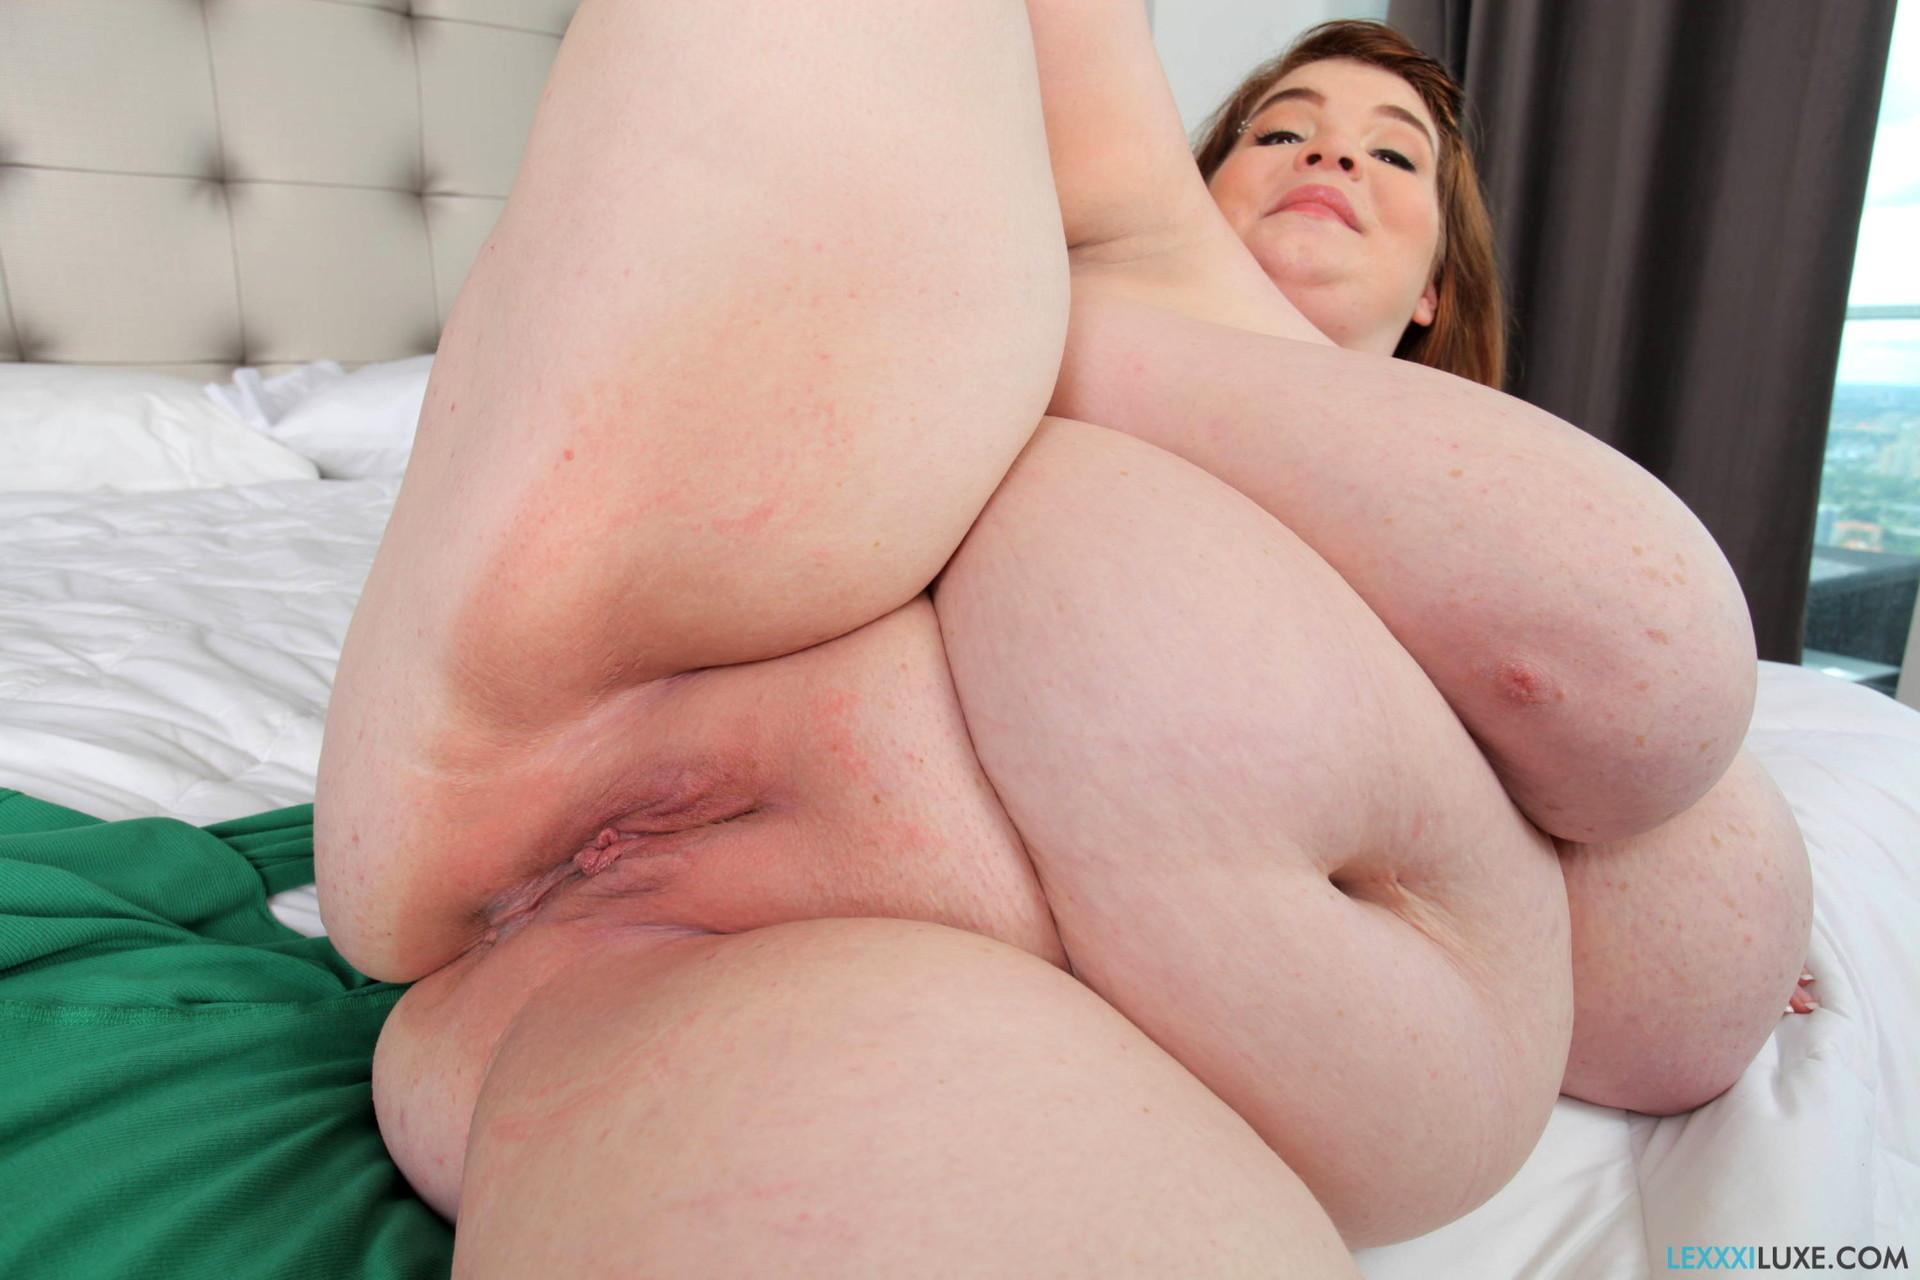 Lexxxi nude porn pics leaked, xxx sex photos